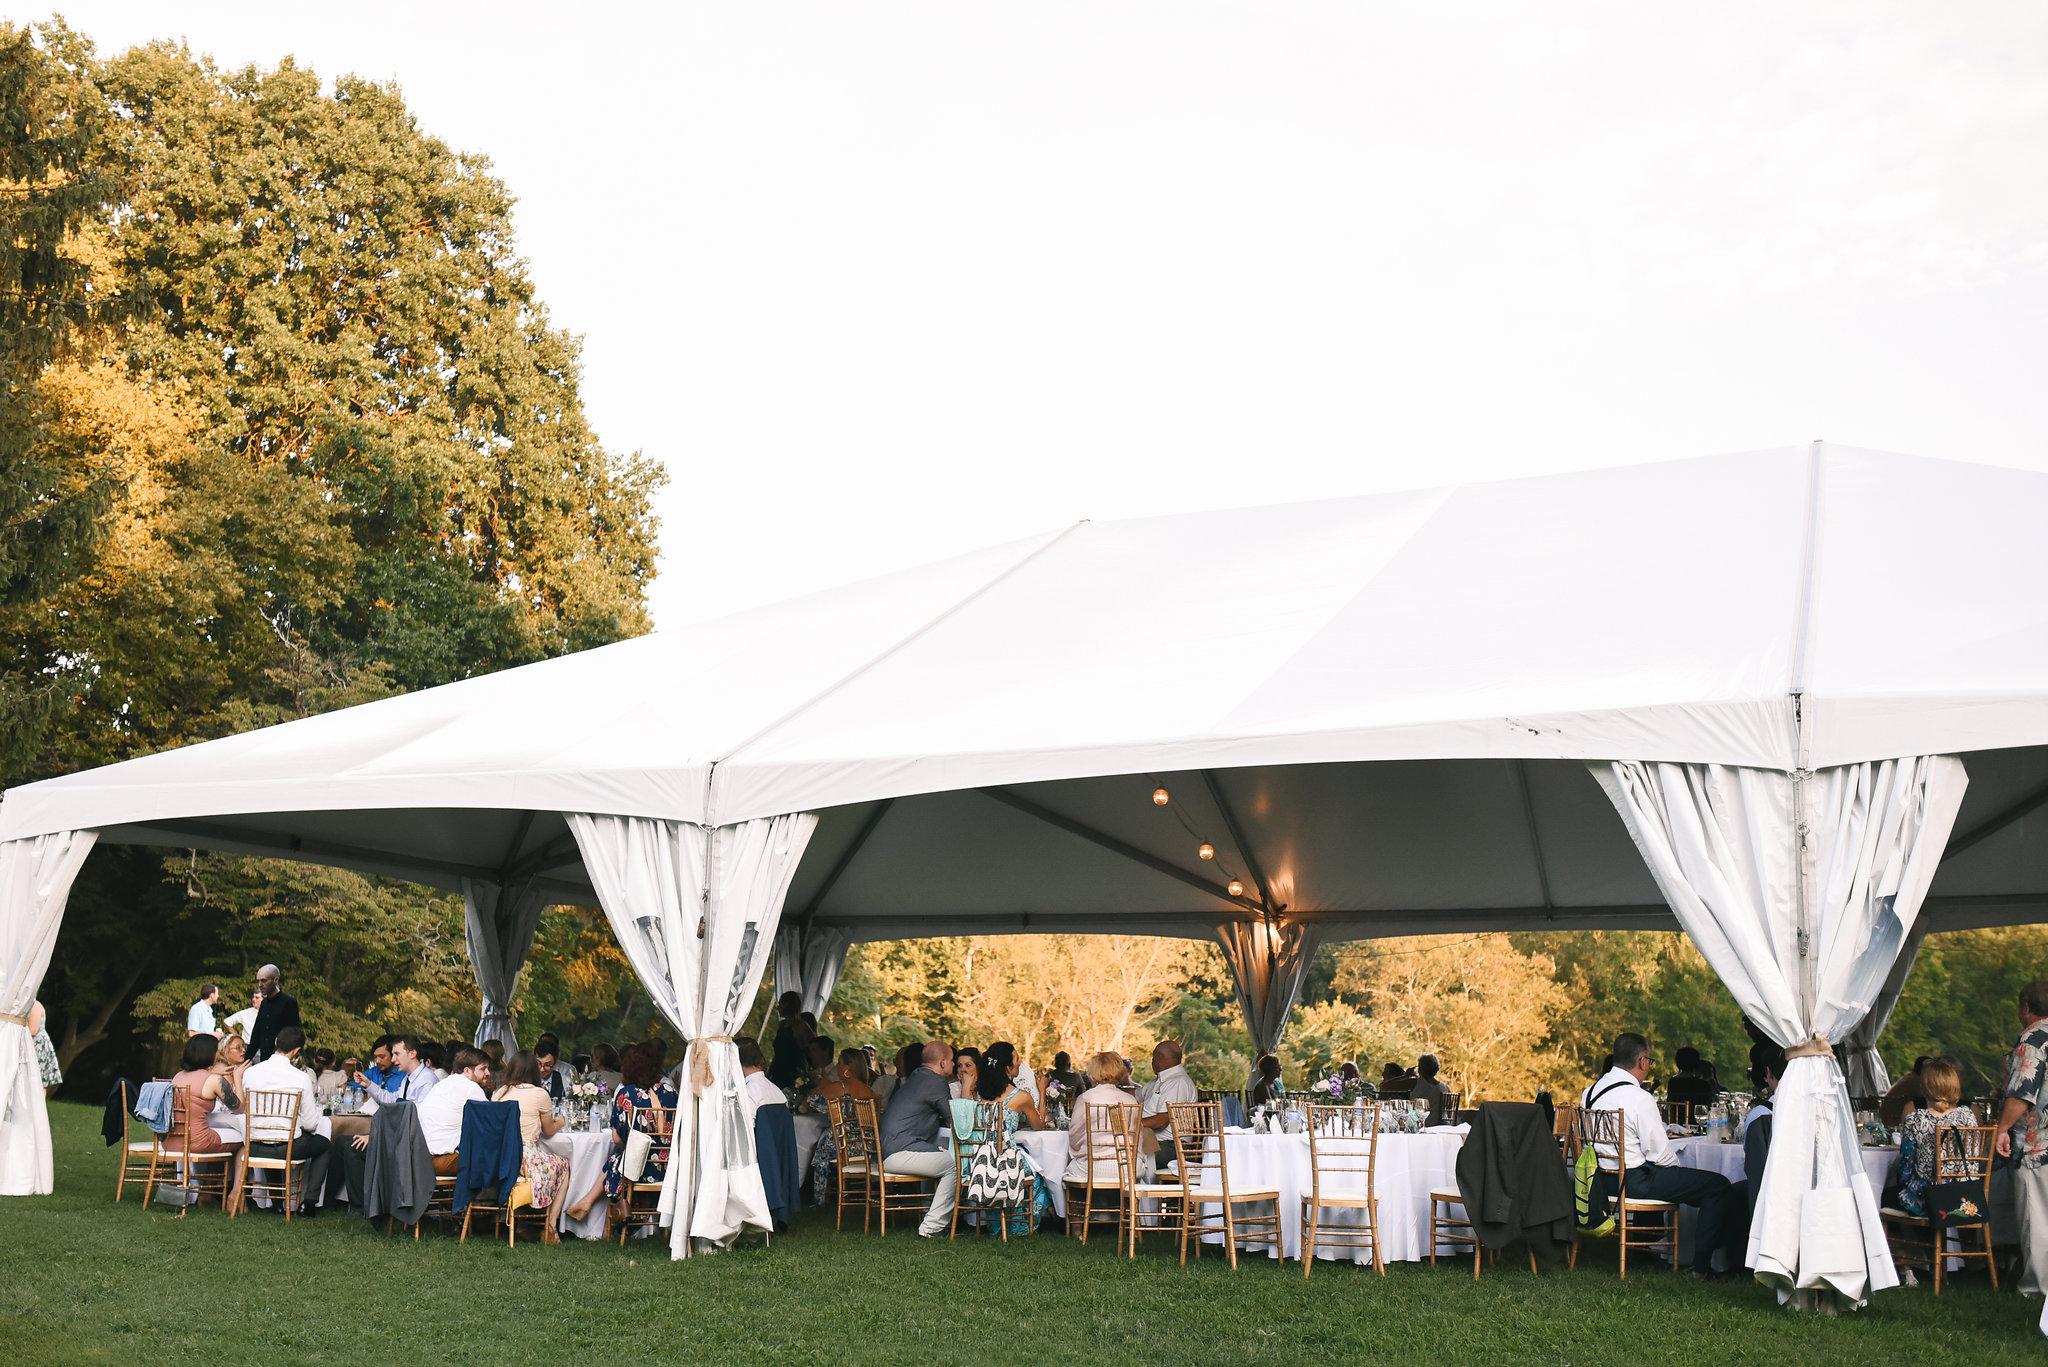 Maryland, Eastern Shore, Baltimore Wedding Photographer, Romantic, Boho, Backyard Wedding, Nature, Outdoor Reception Under White Tent, Wedding Guests Enjoying Reception